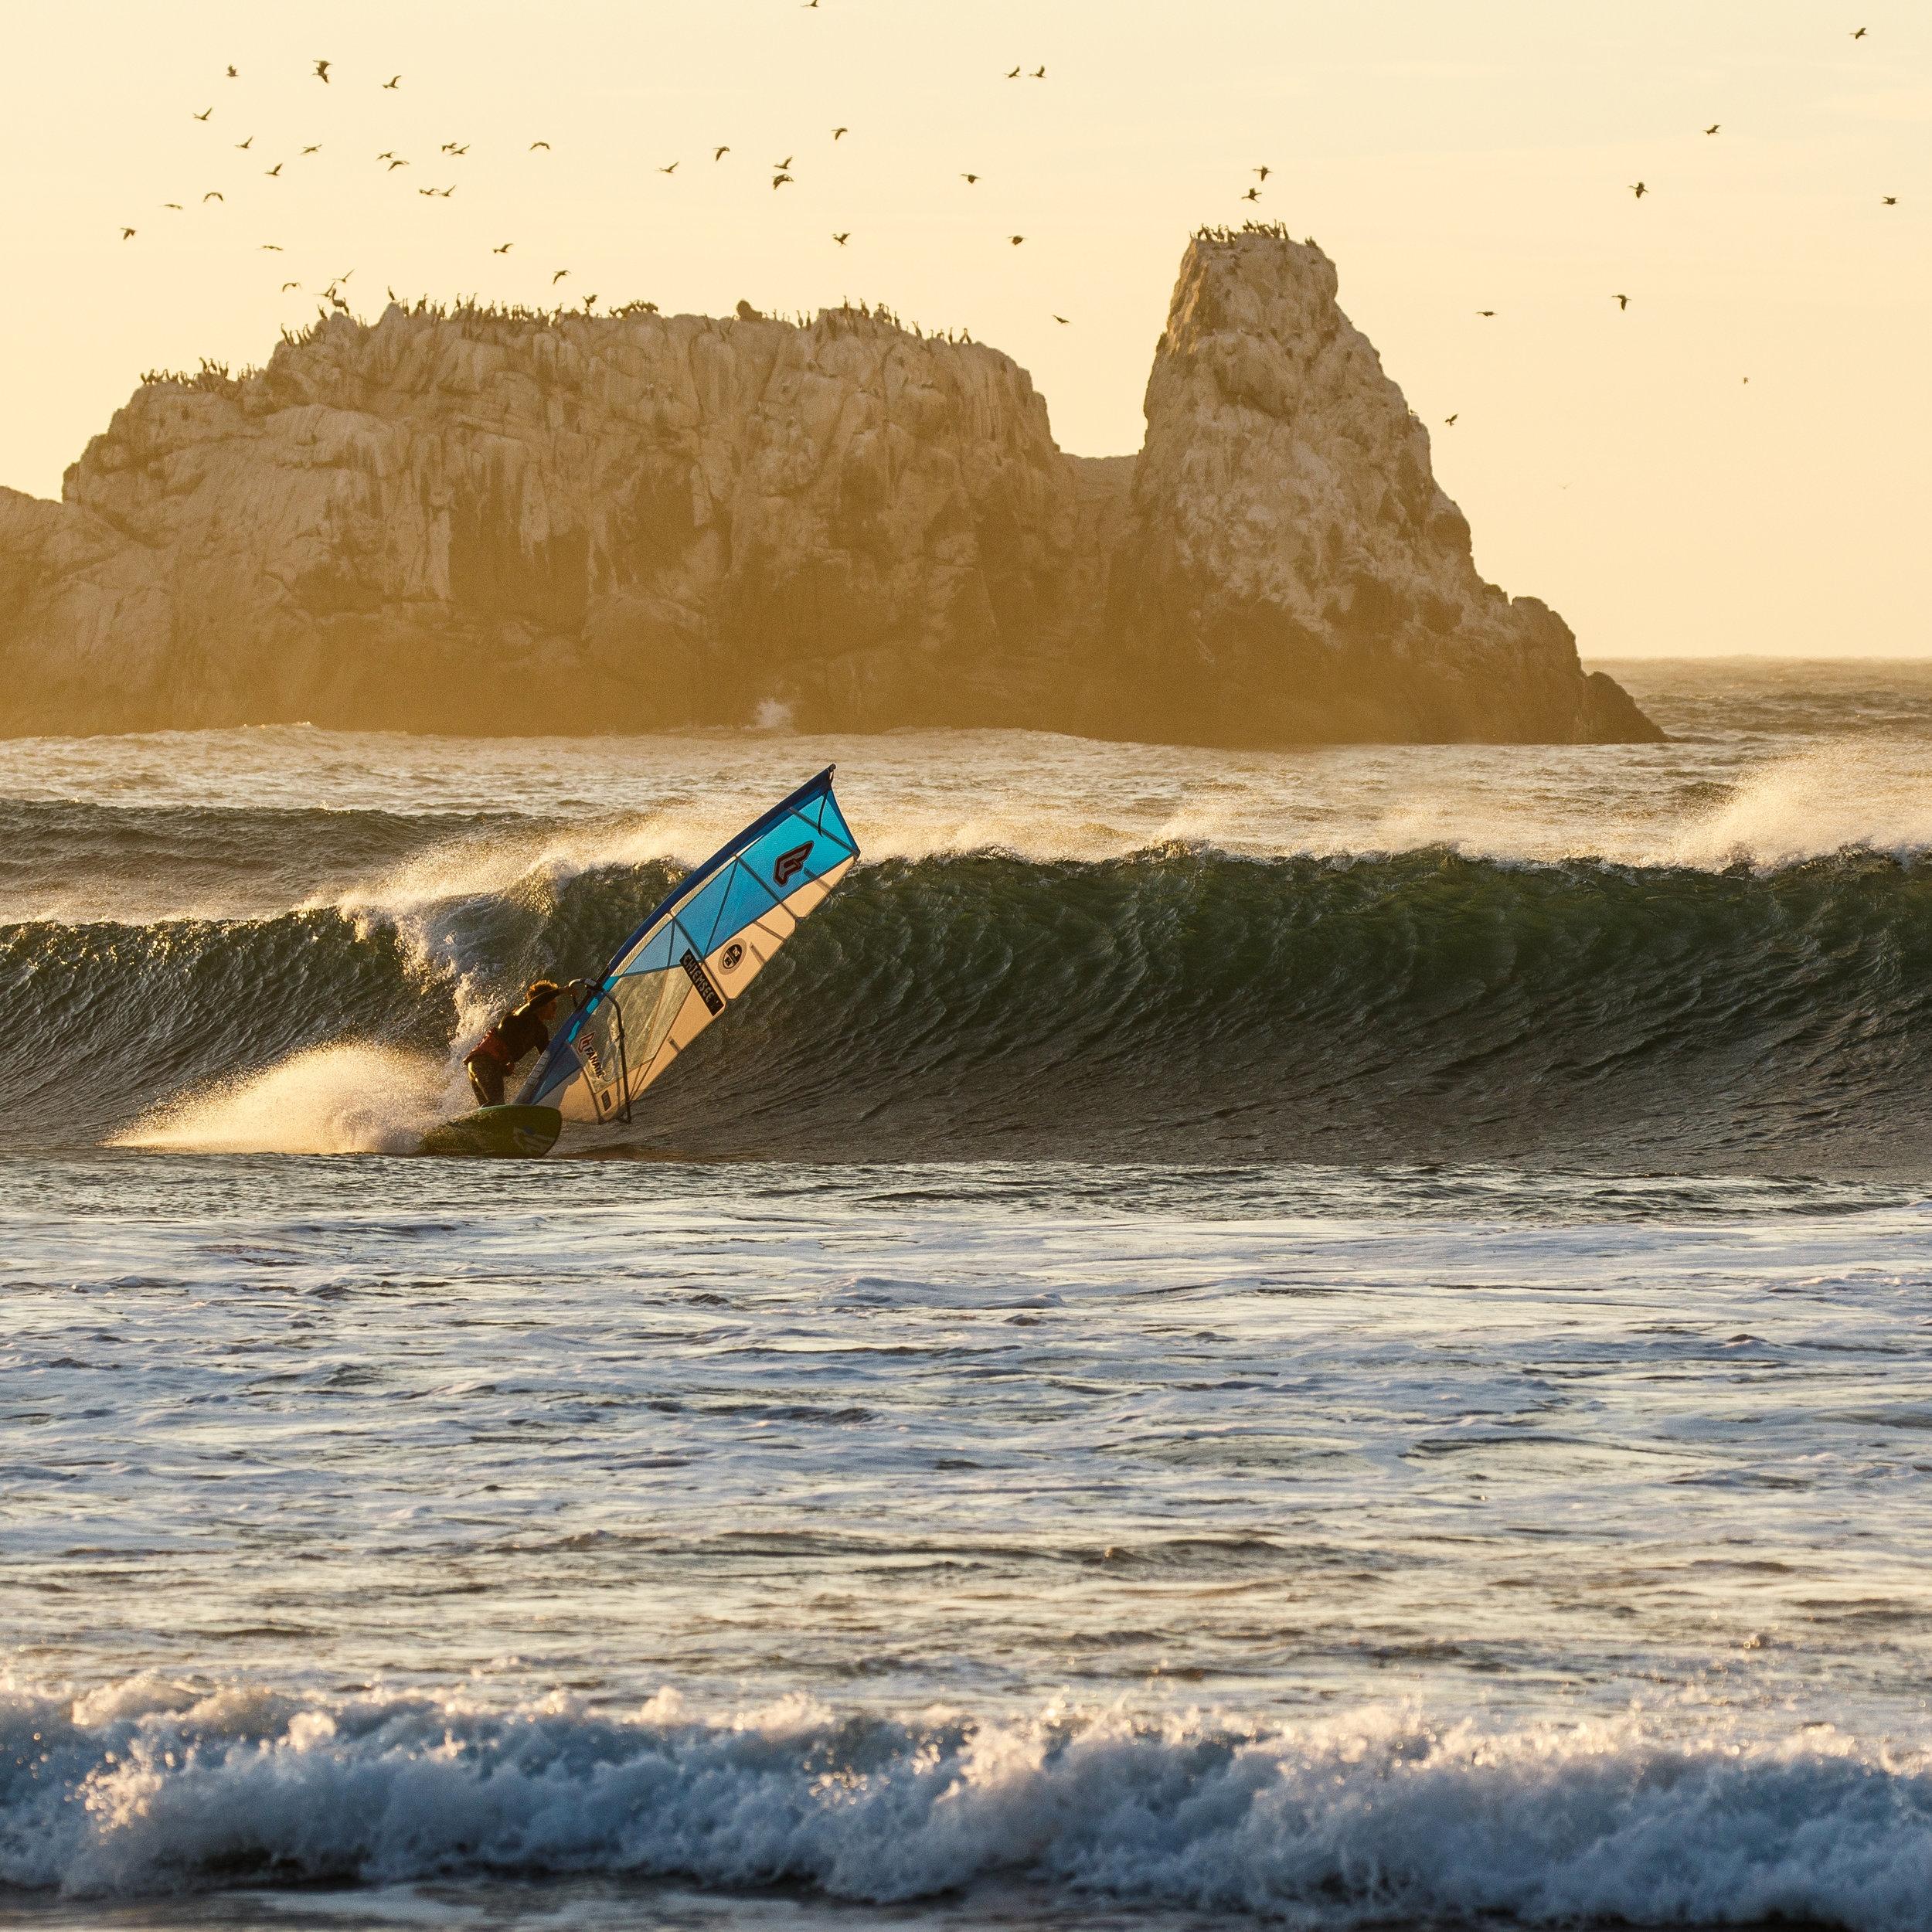 klaas voget  - Surfprofi -